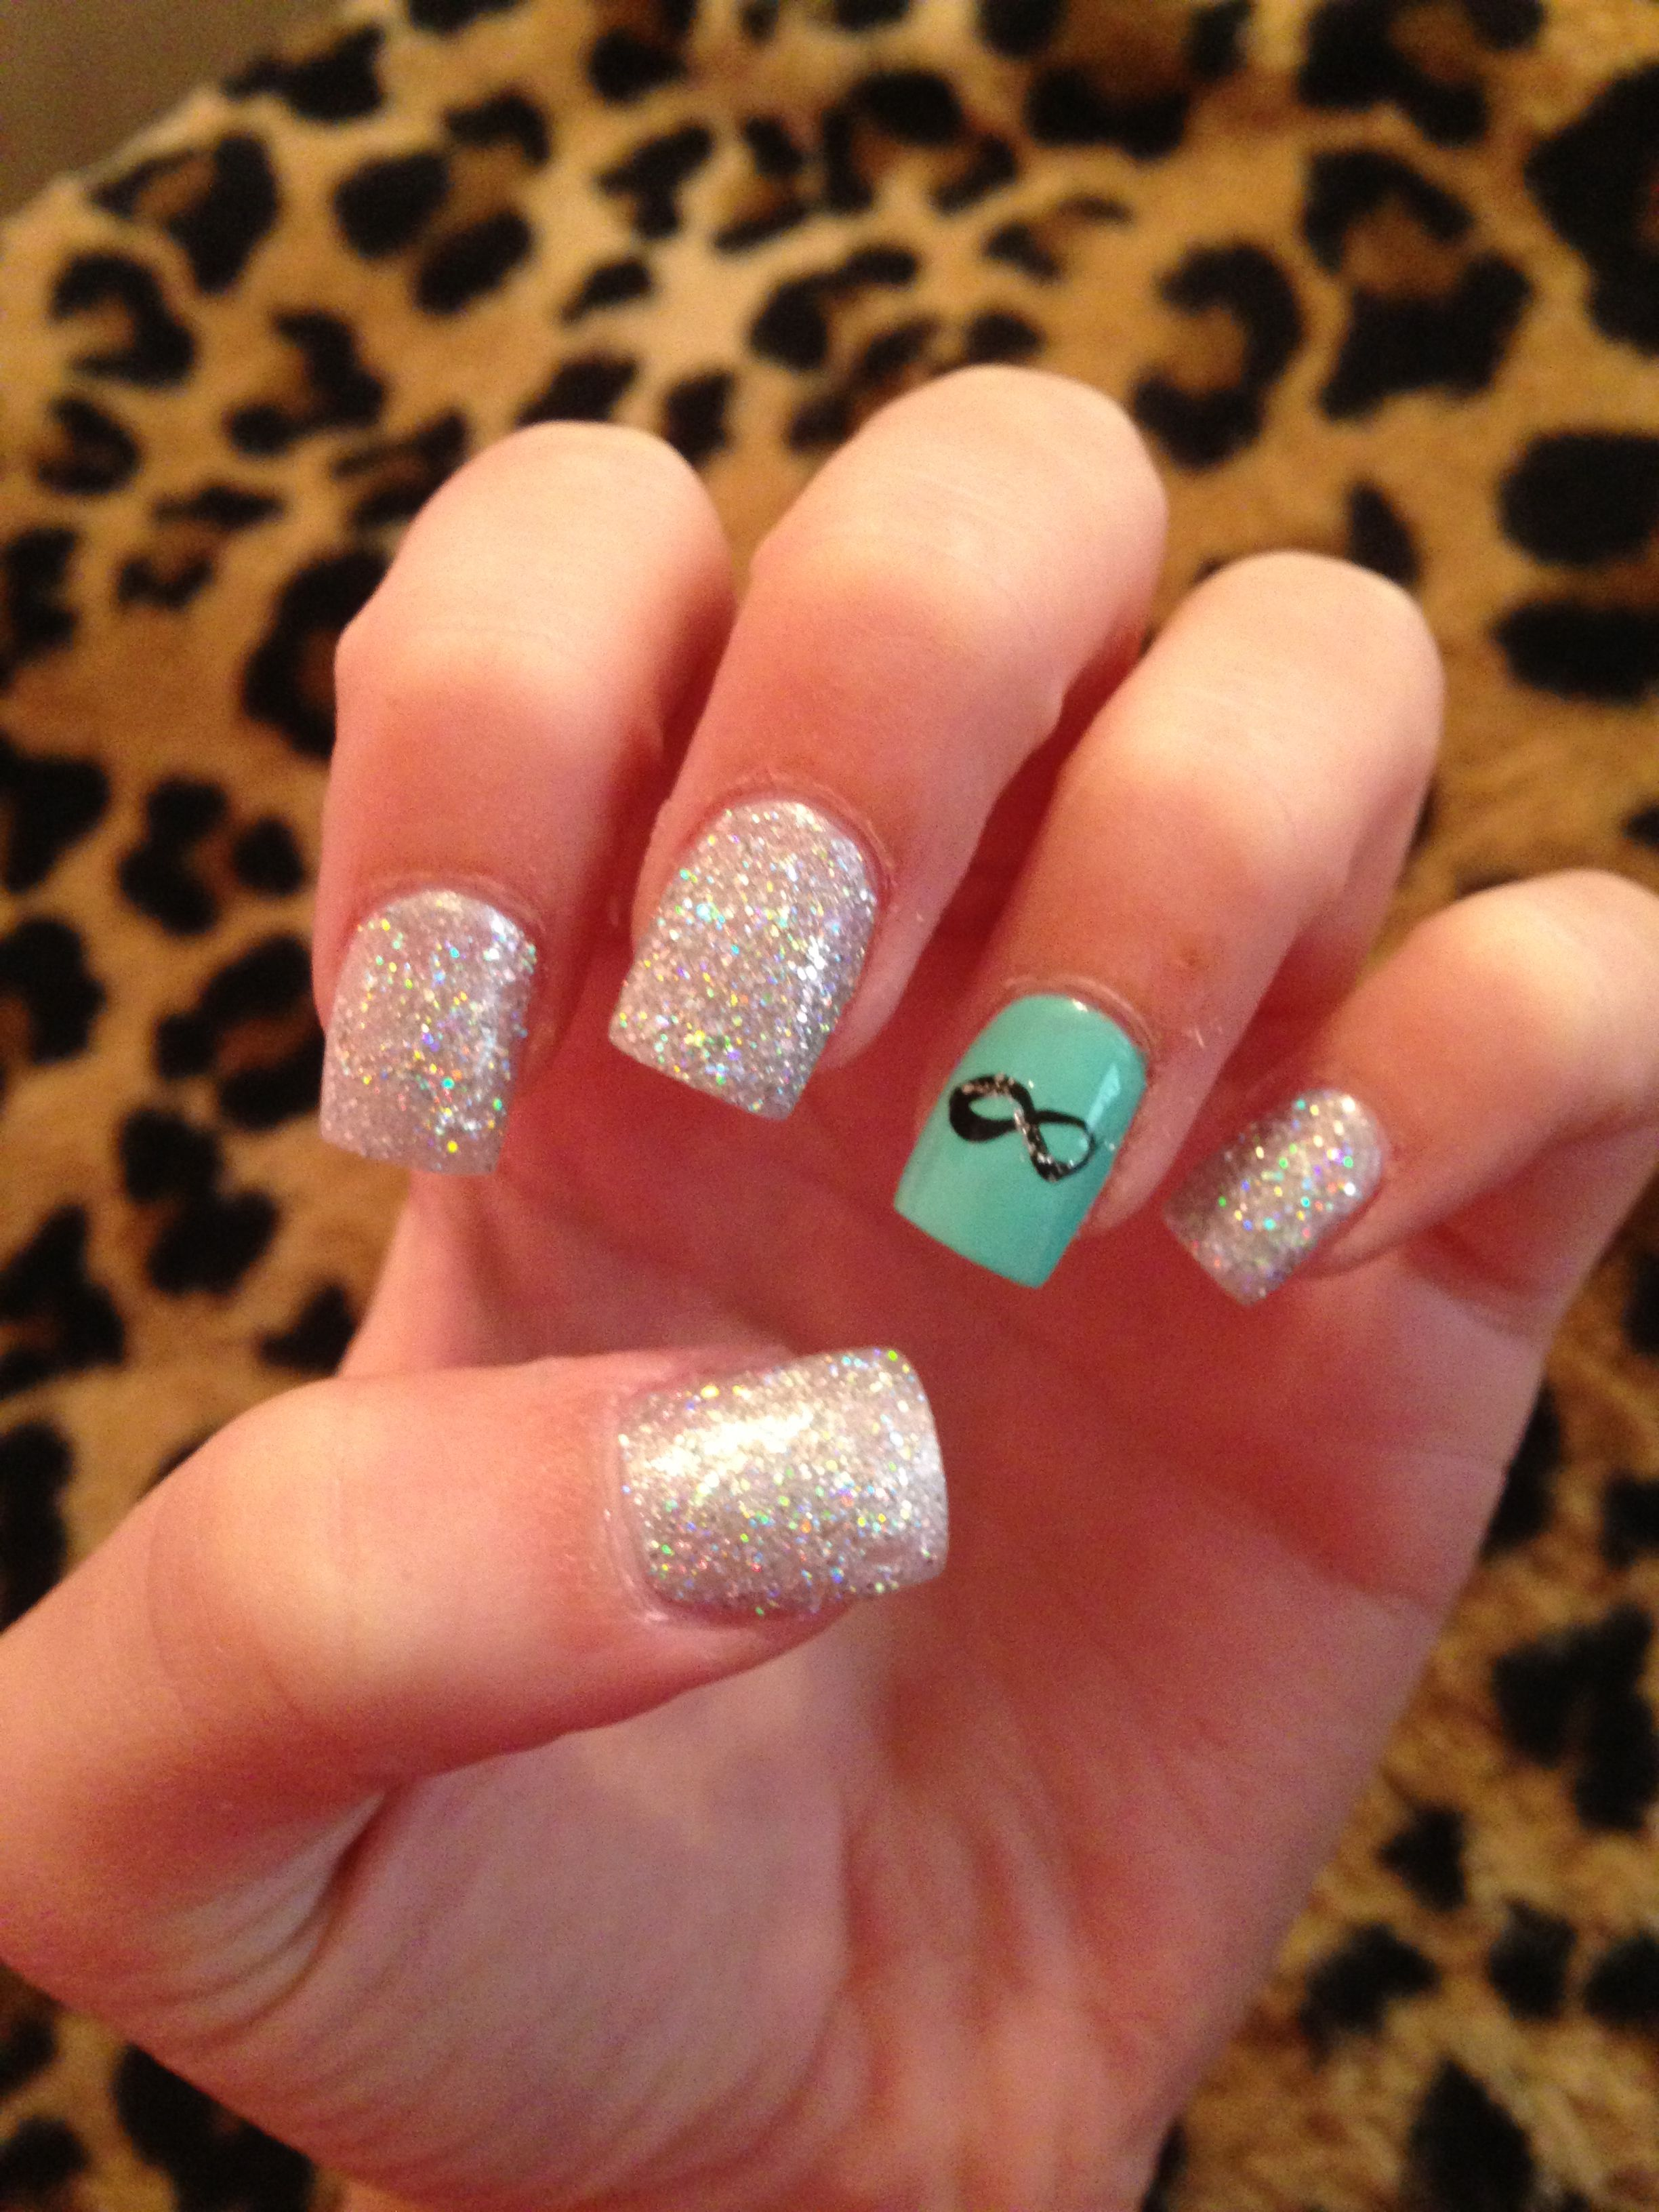 Sparkly infinity nails! | Nails | Pinterest | Infinity nails, Nail ...